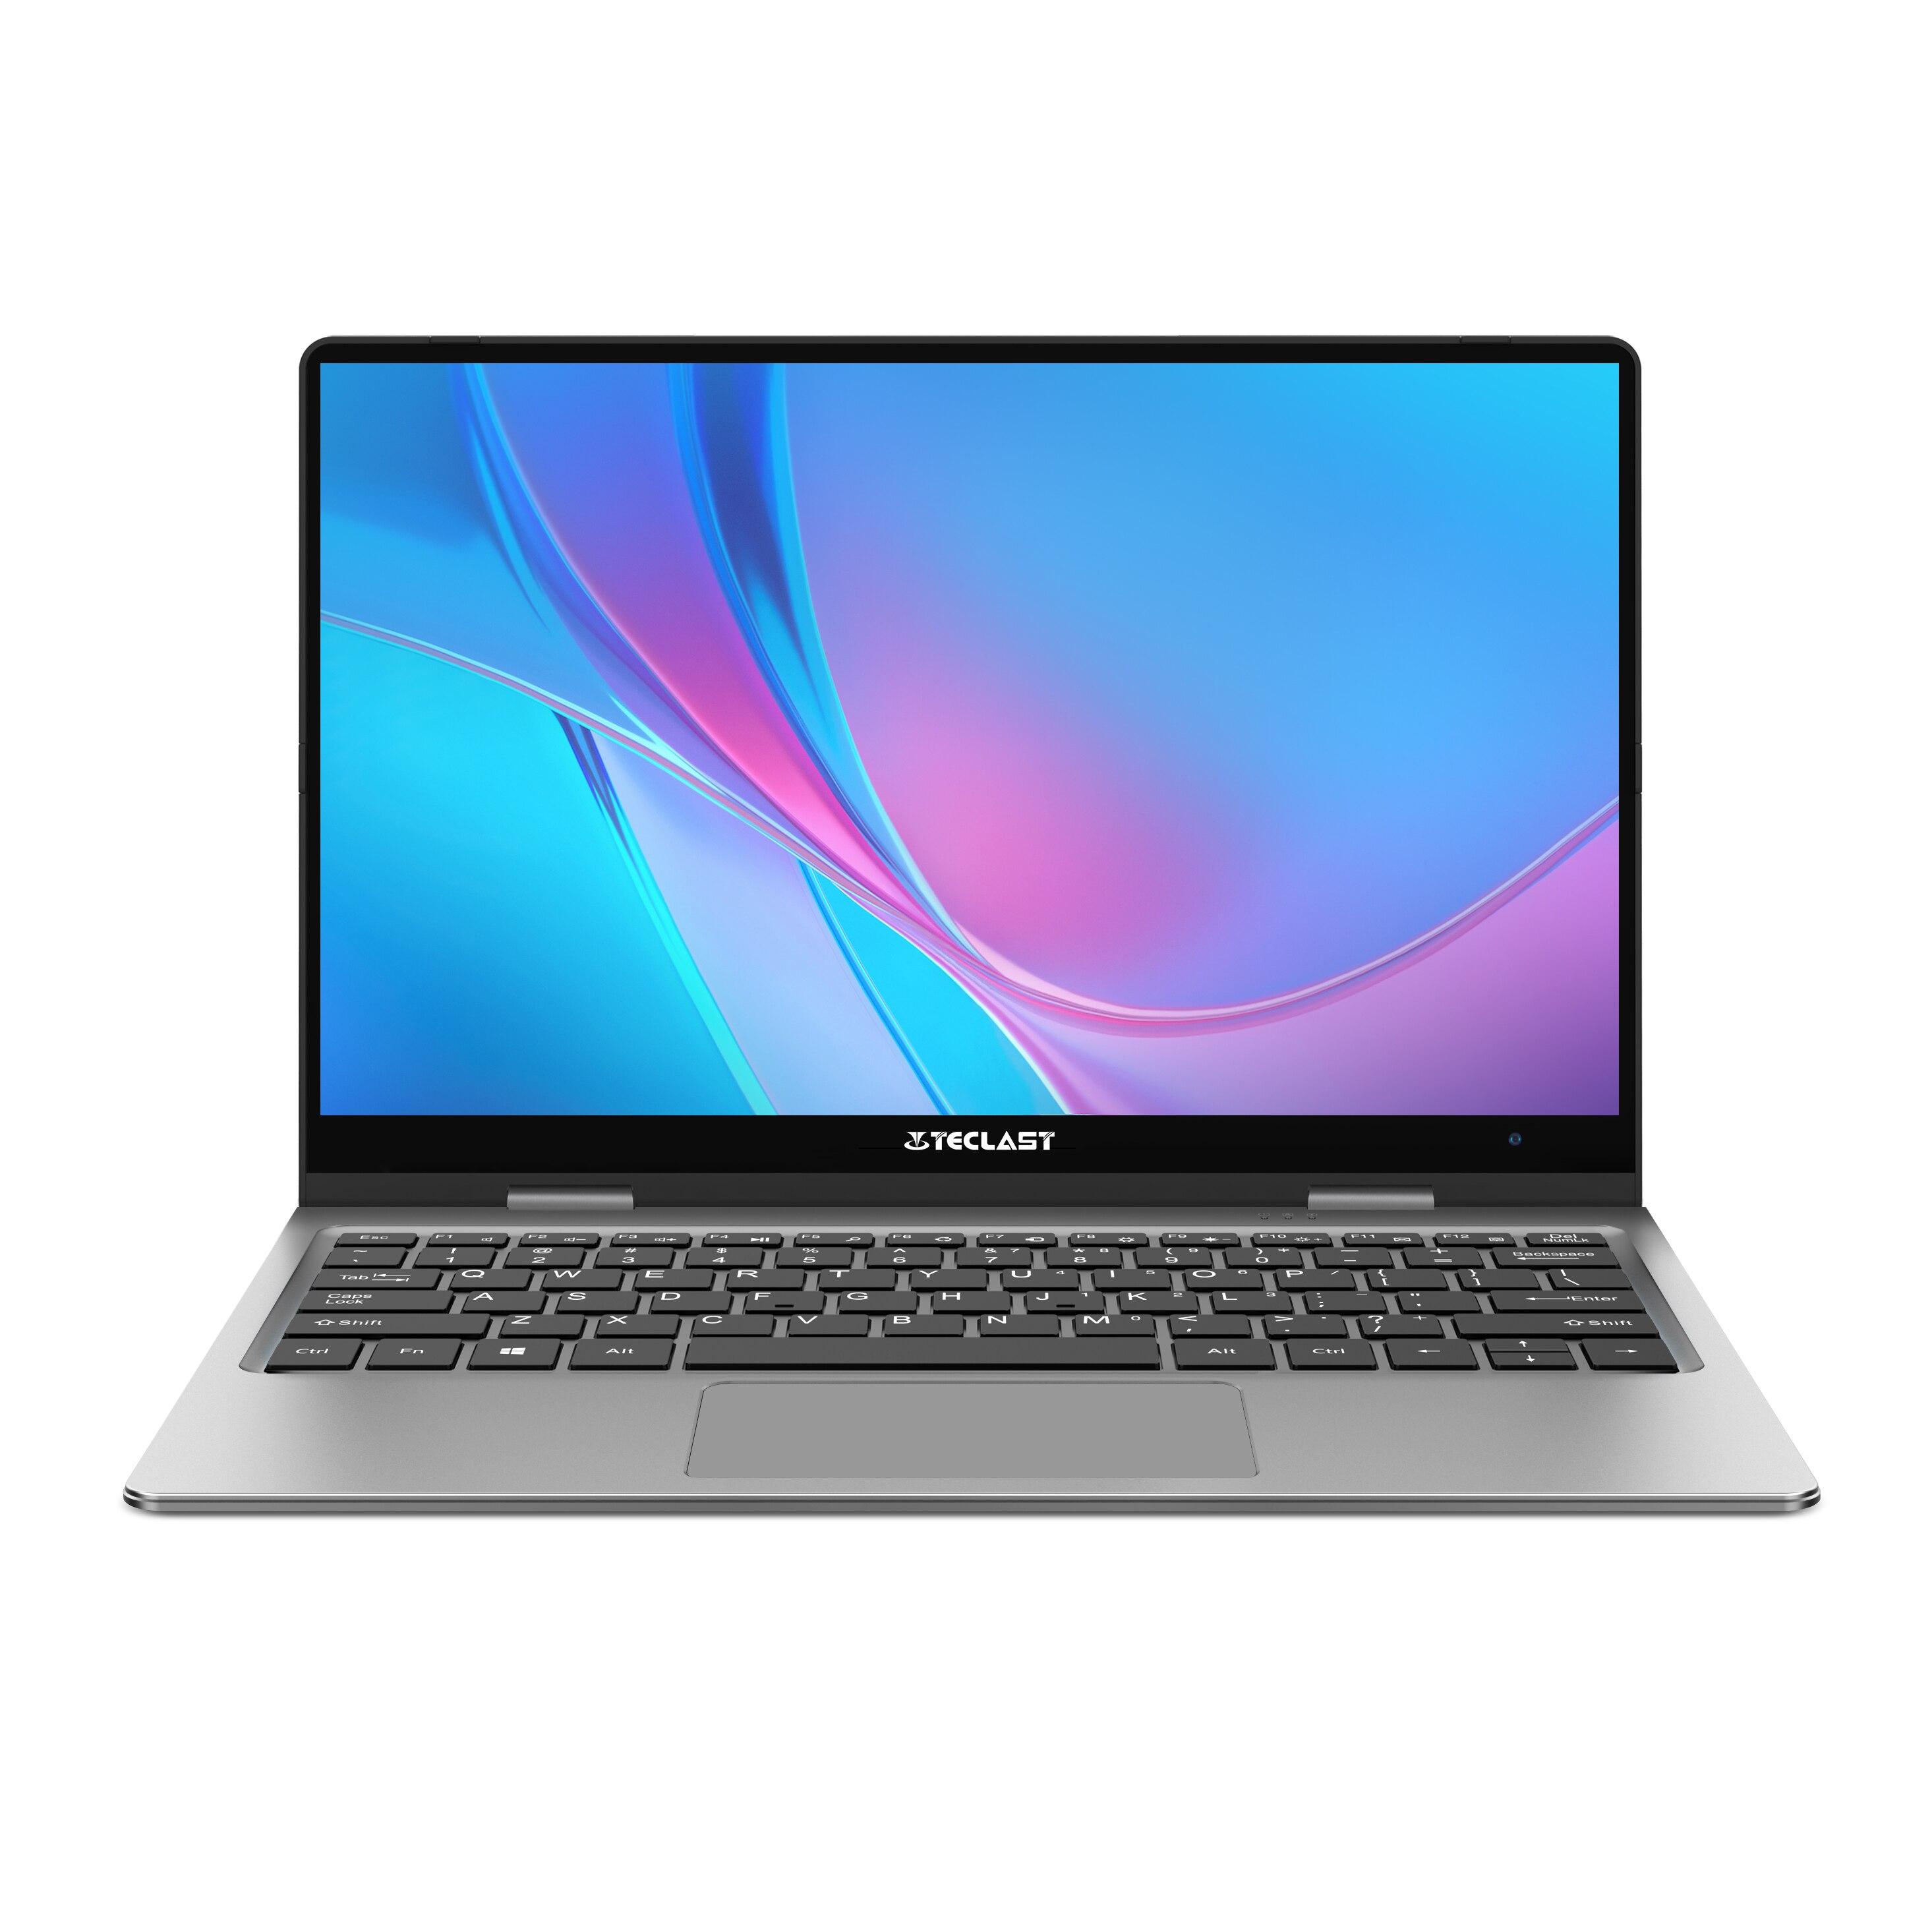 Ноутбук Teclast F5 8 ГБ ОЗУ 256 ГБ SSD Windows 10 Intel Gemini Lake N4100 четырехъядерный 360 Вращающийся сенсорный экран 11,6